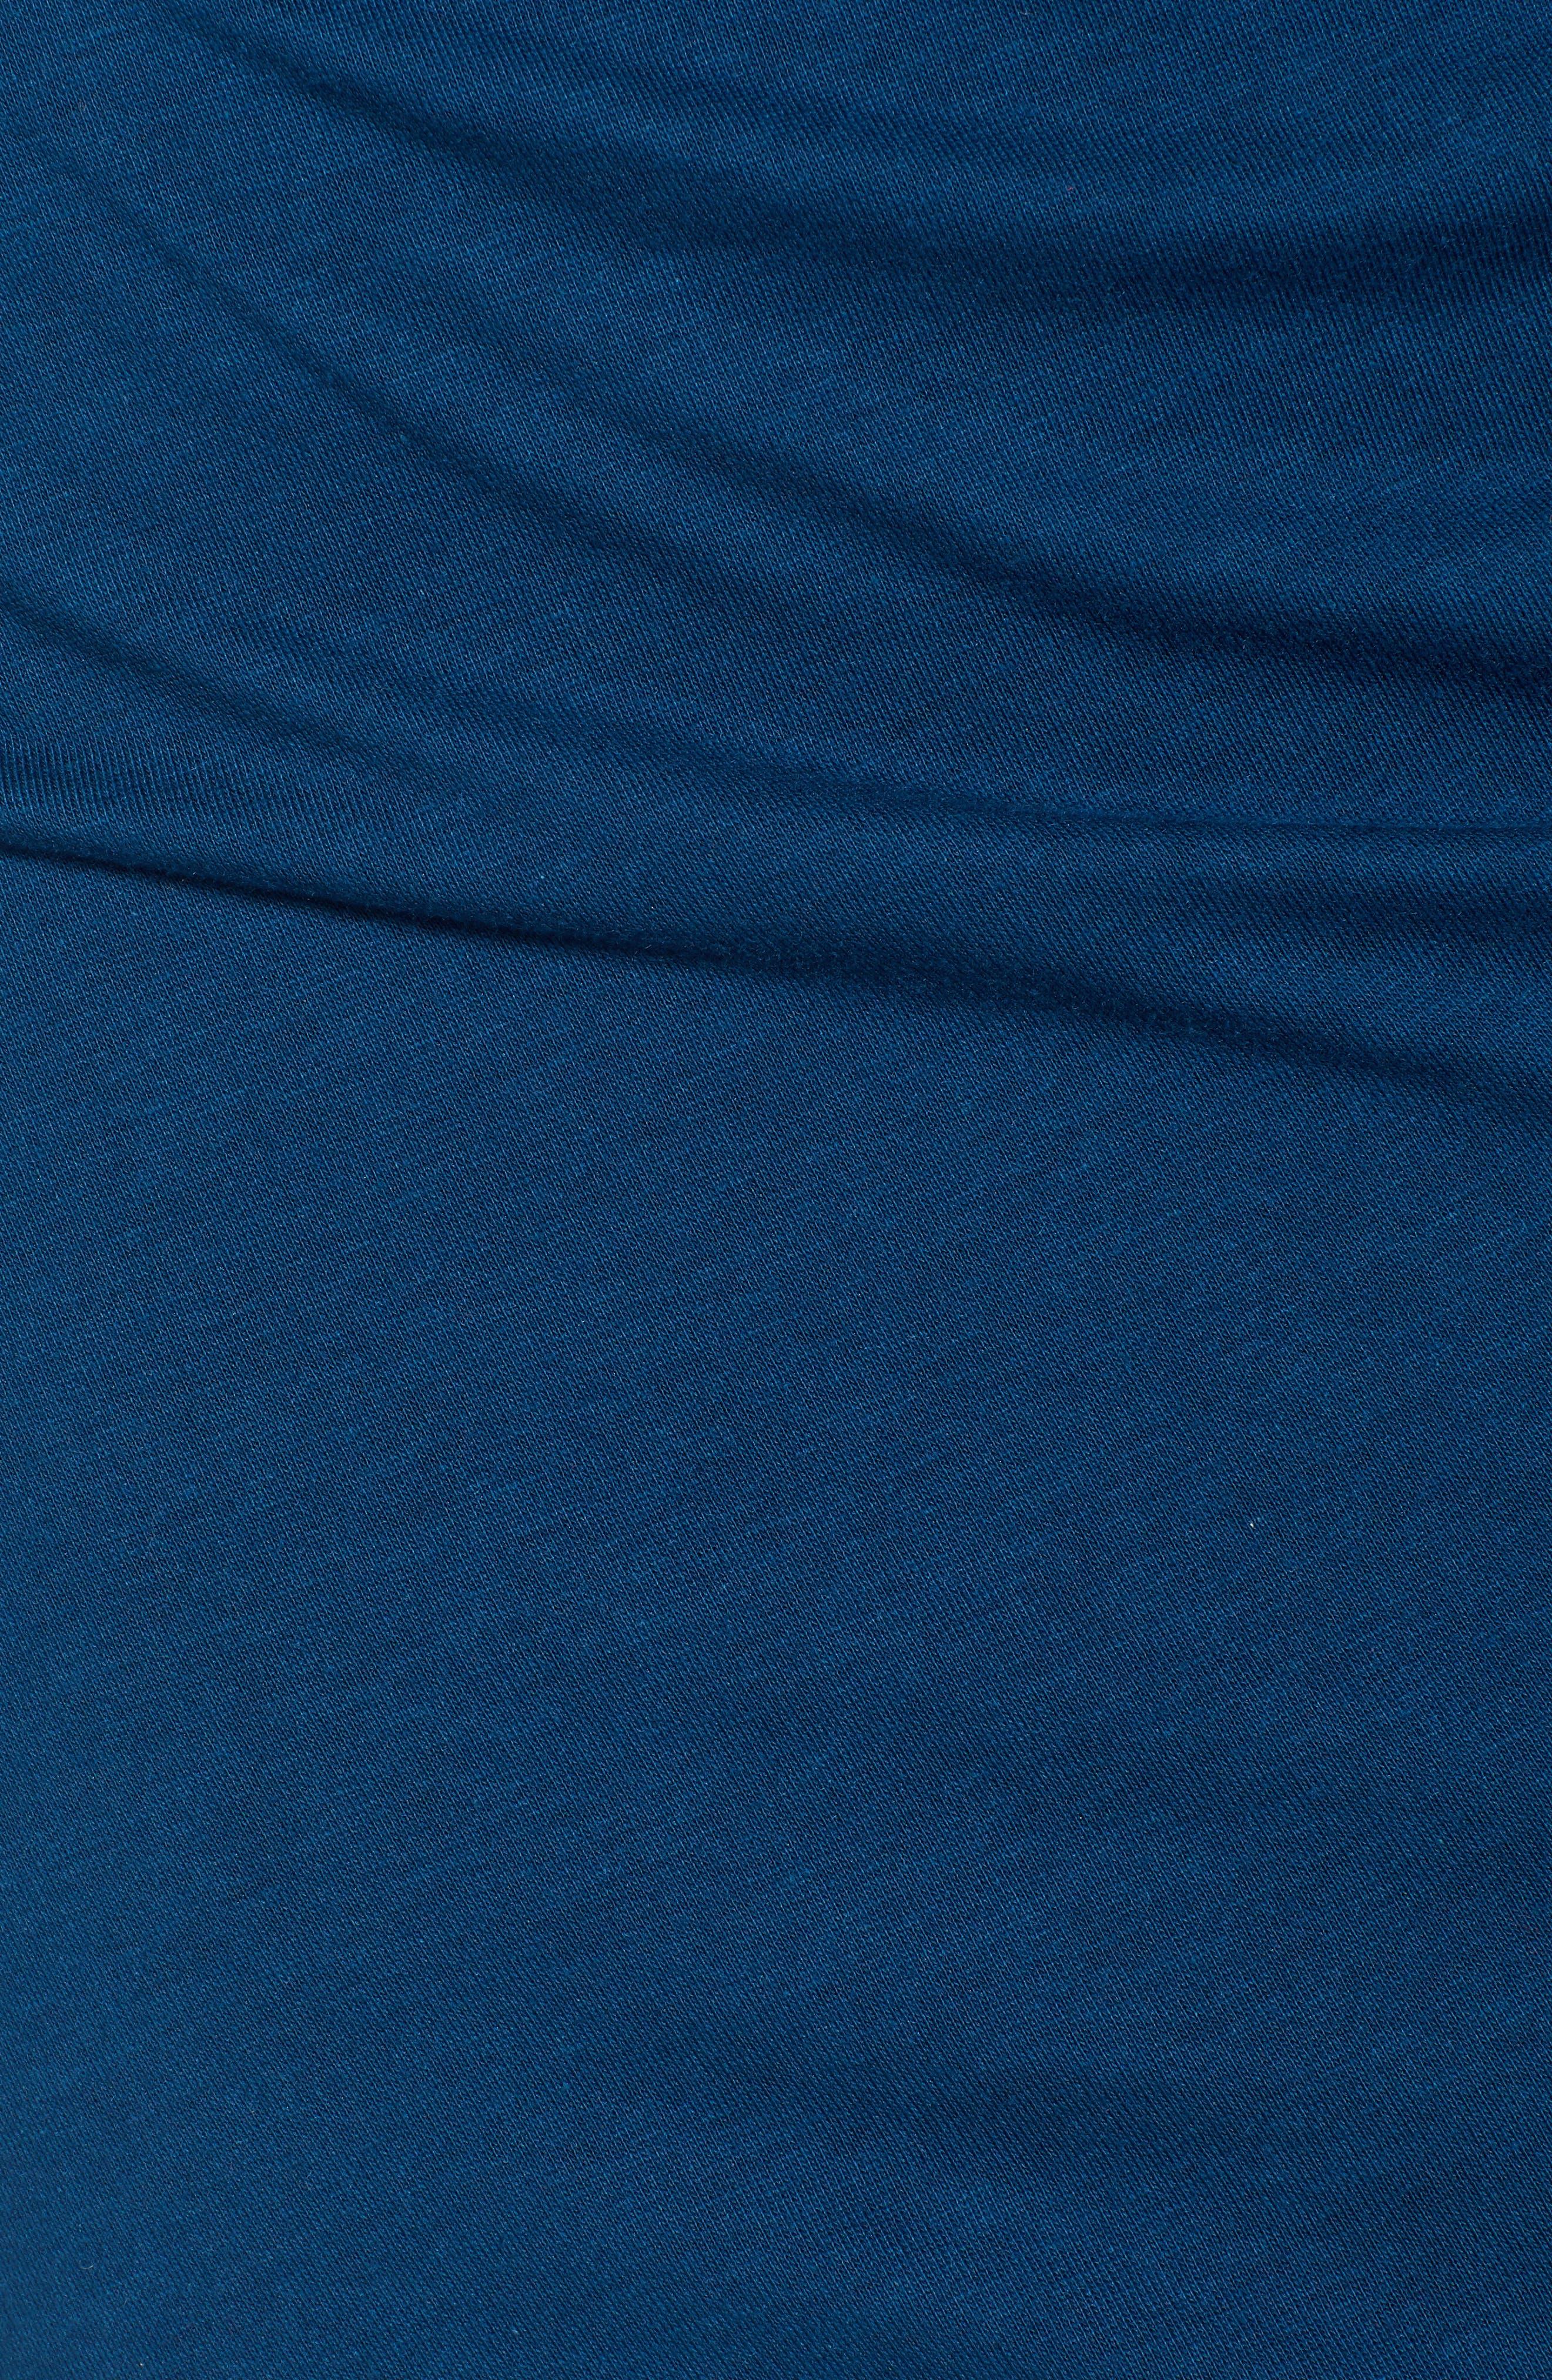 Ruched Long Sleeve Dress,                             Alternate thumbnail 6, color,                             BLUE AURORA